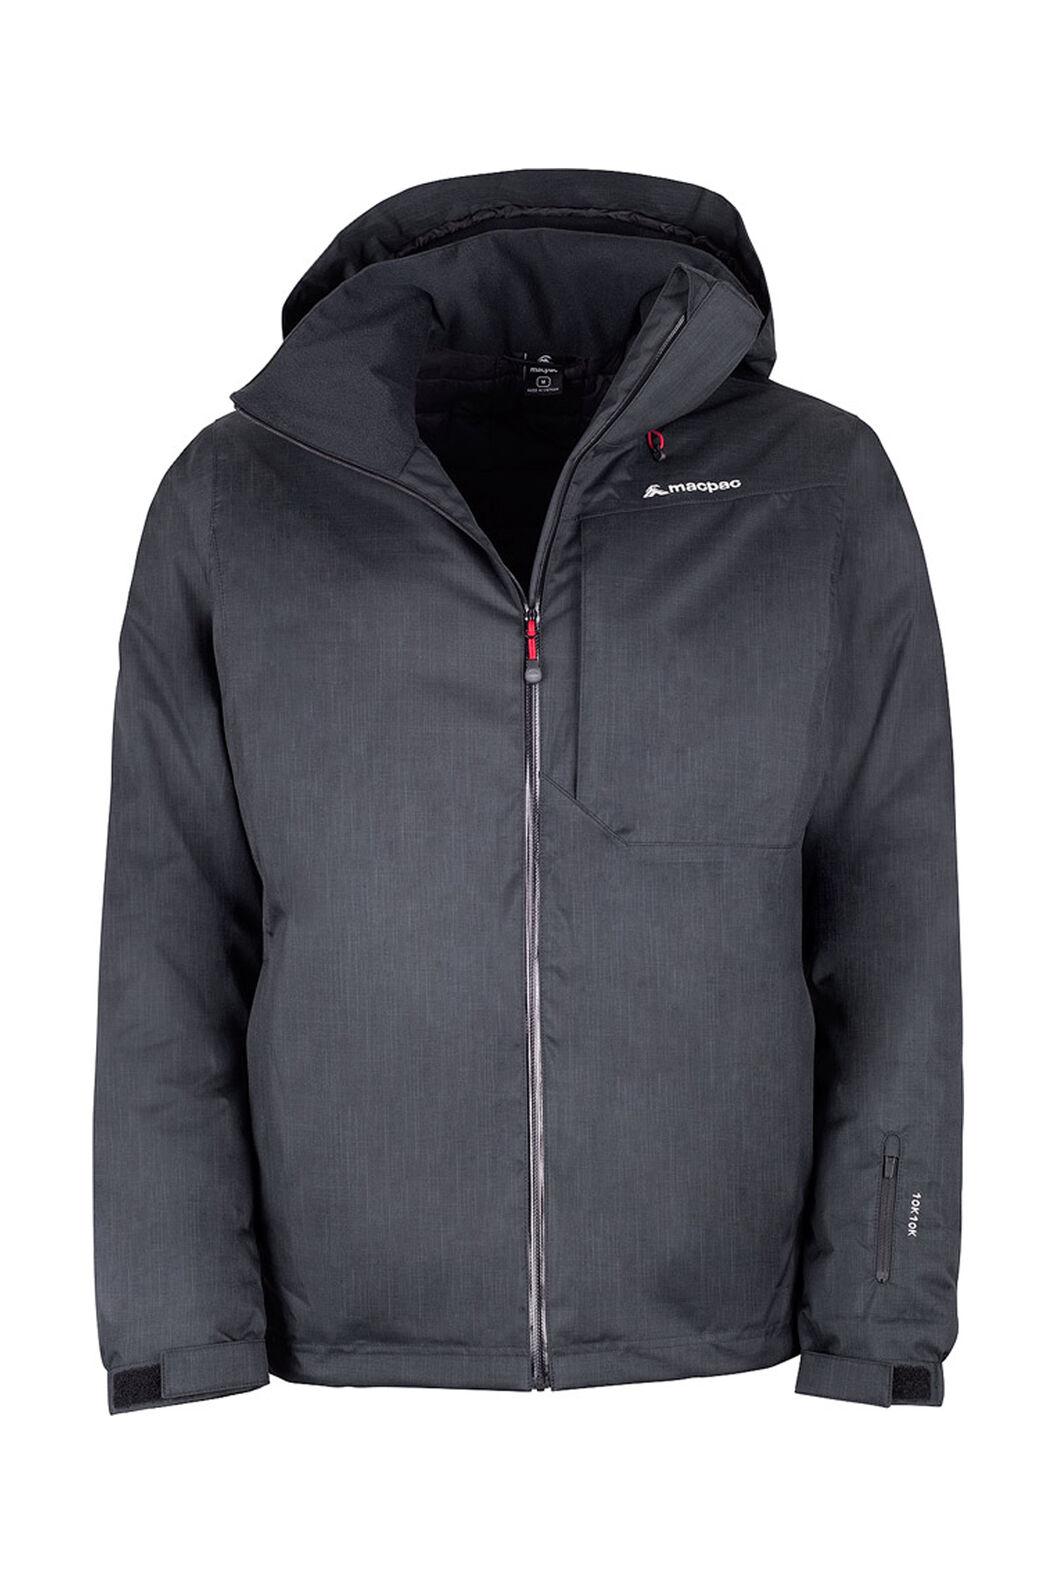 Macpac Powder Reflex™ Ski Jacket — Men's, Black/Black, hi-res